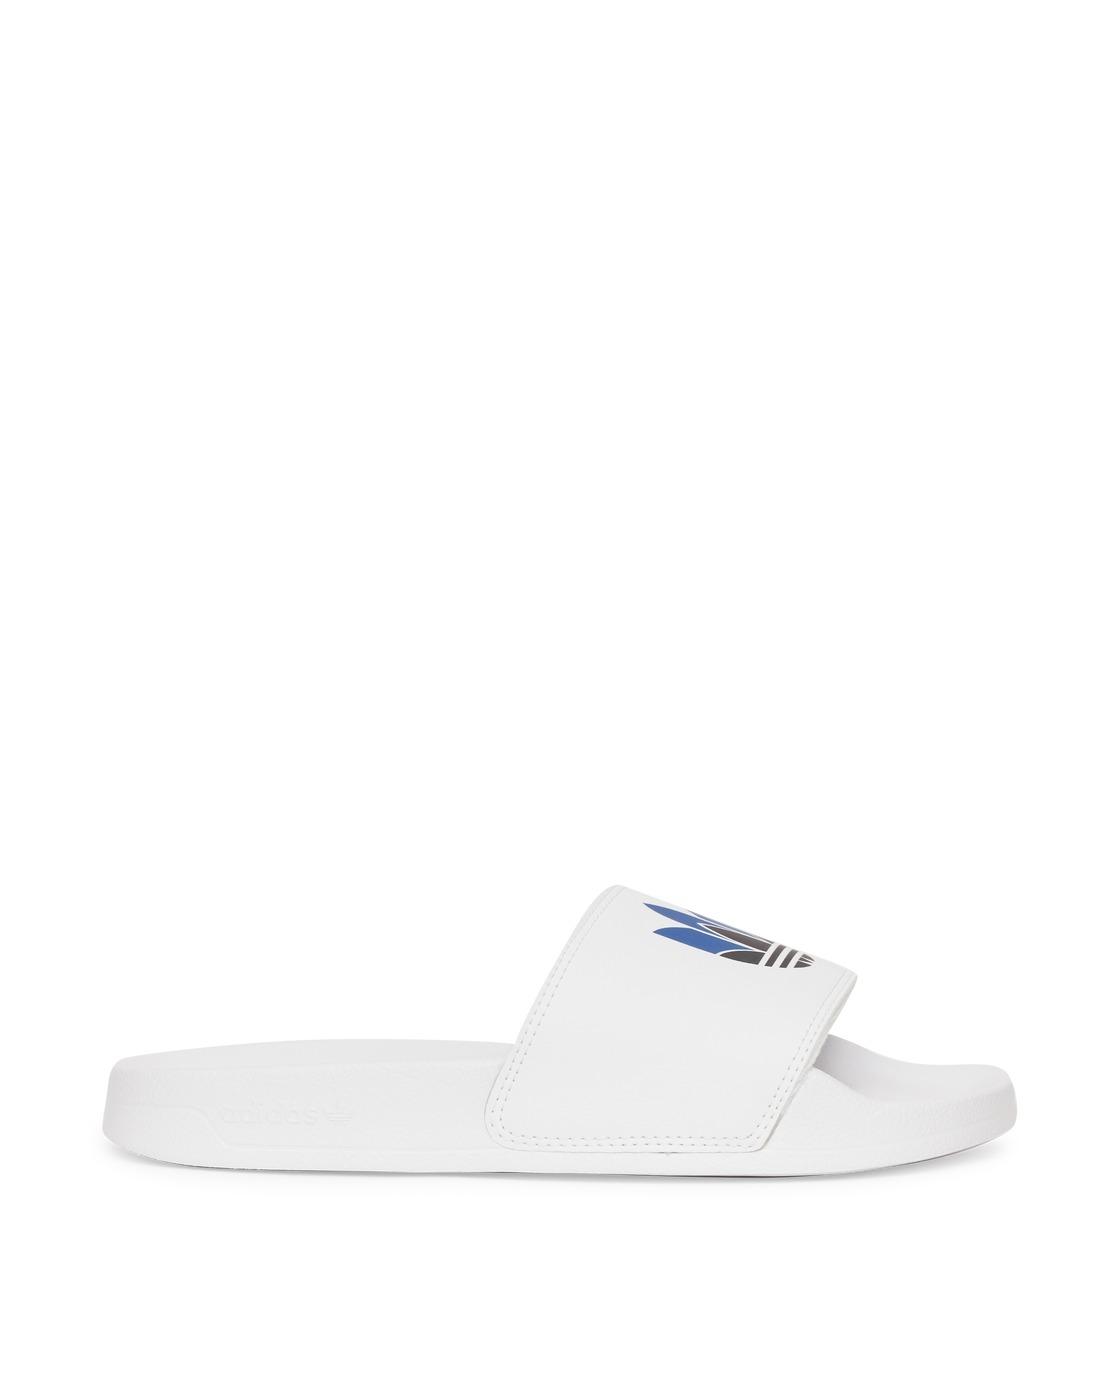 Photo: Adidas Originals Adilette Lite Slides Future White